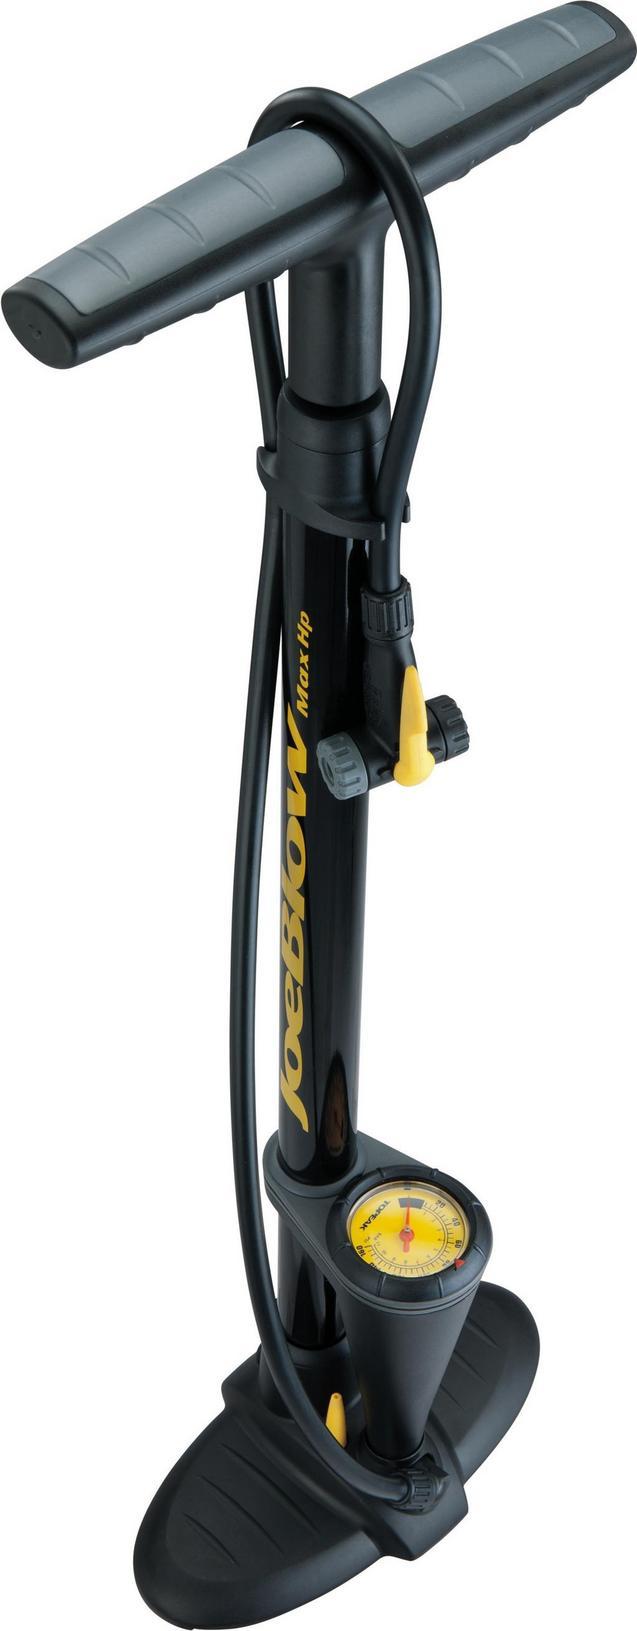 joe blow max hp floor pump